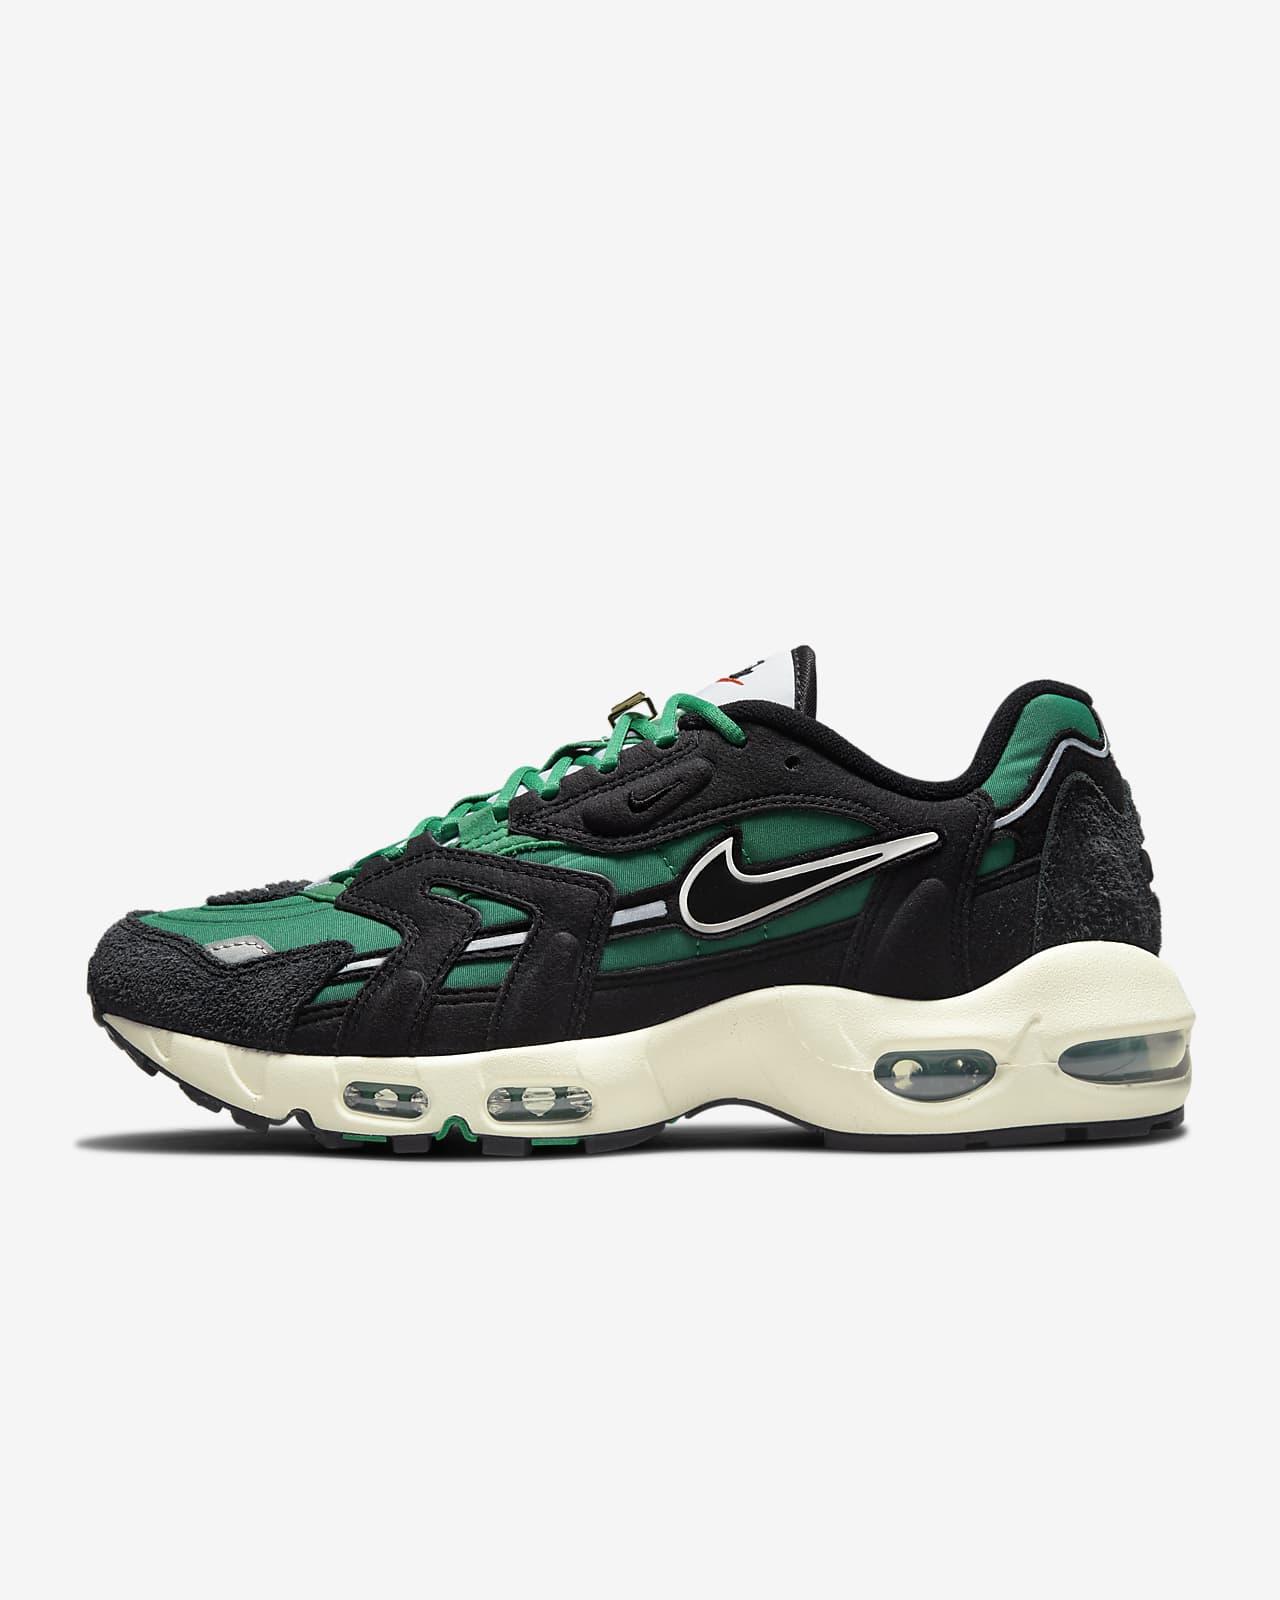 Nike Air Max 96 2 SE Men's Shoes